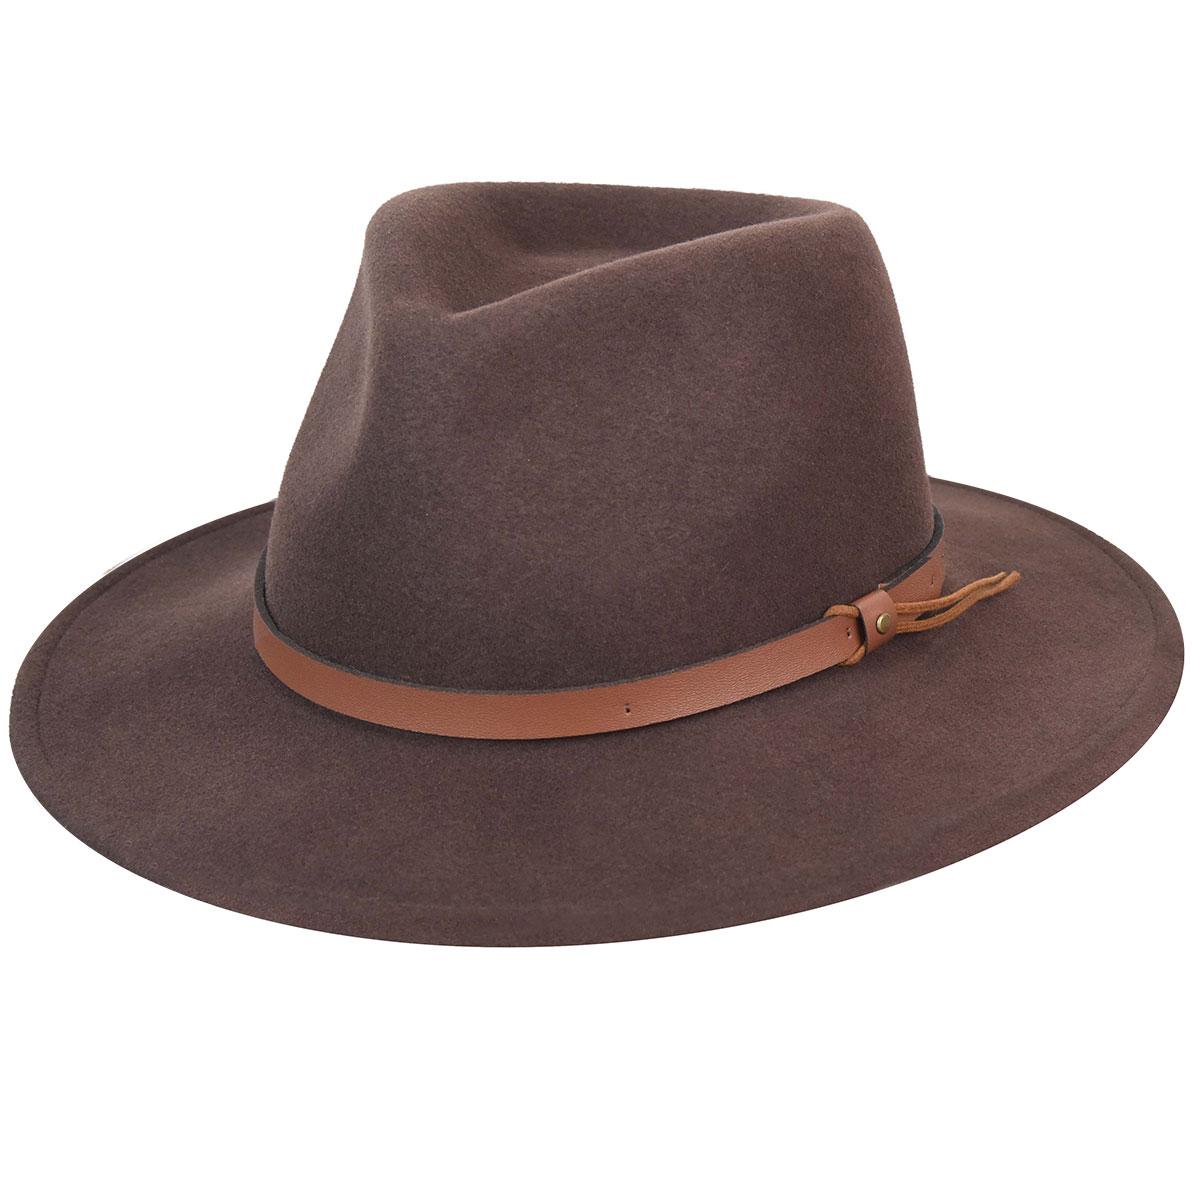 Pantropic Dakota LiteFelt Outback in Brown